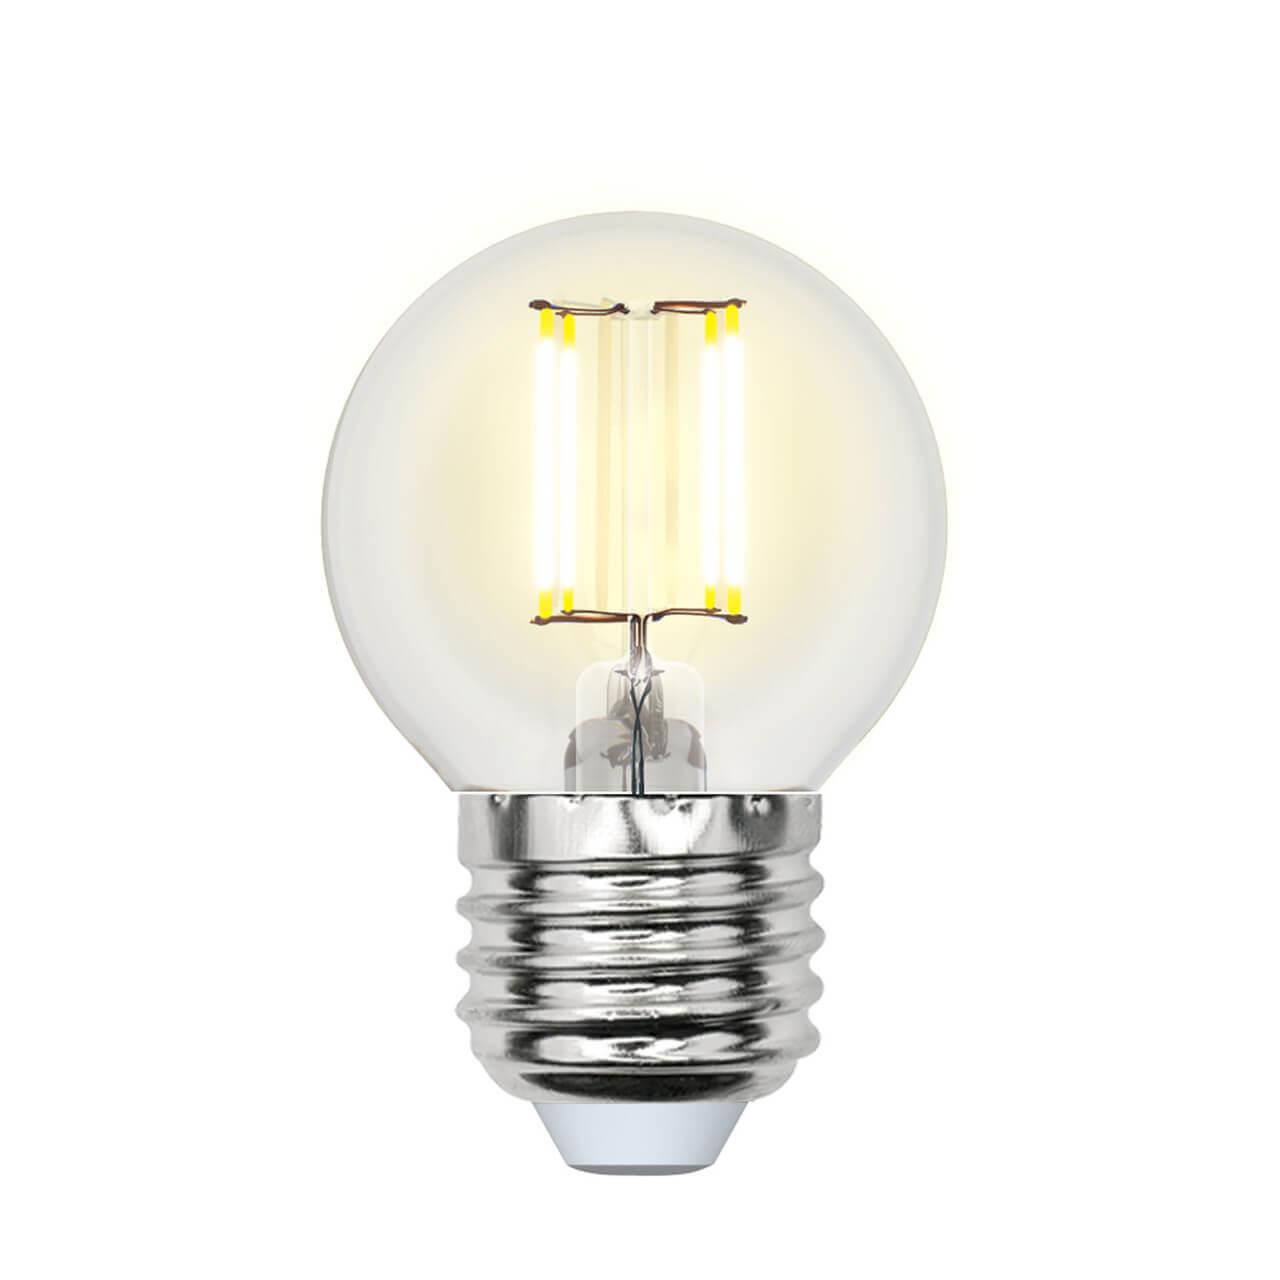 Лампочка Uniel LED-G45-6W/NW/E27/CL PLS02WH SKY Globe лампочка uniel led g45 9w 3000k e27 cl pls02wh led g45